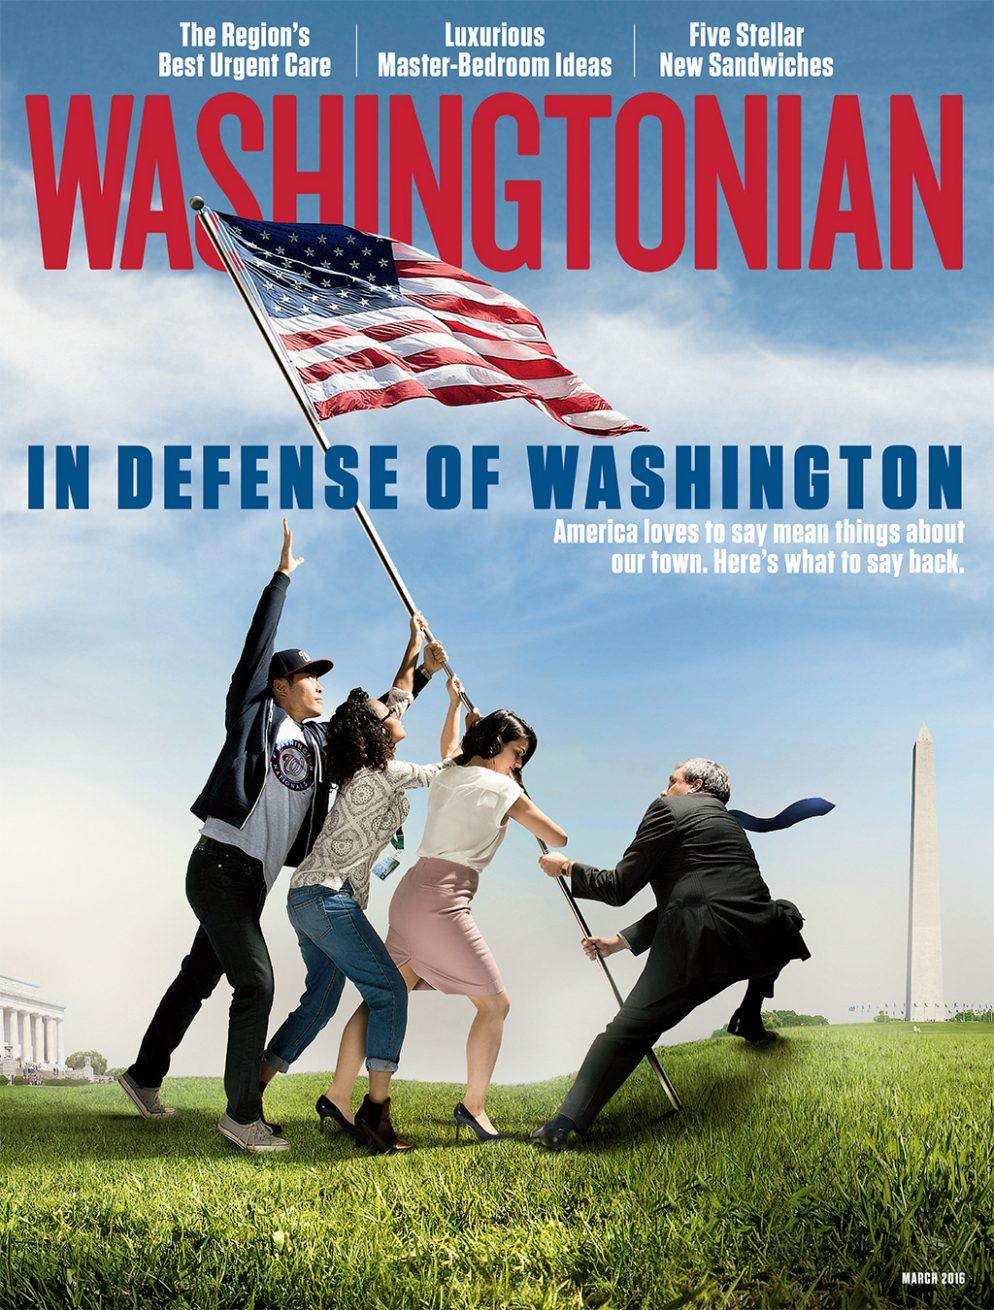 March 2016: In Defense of Washington